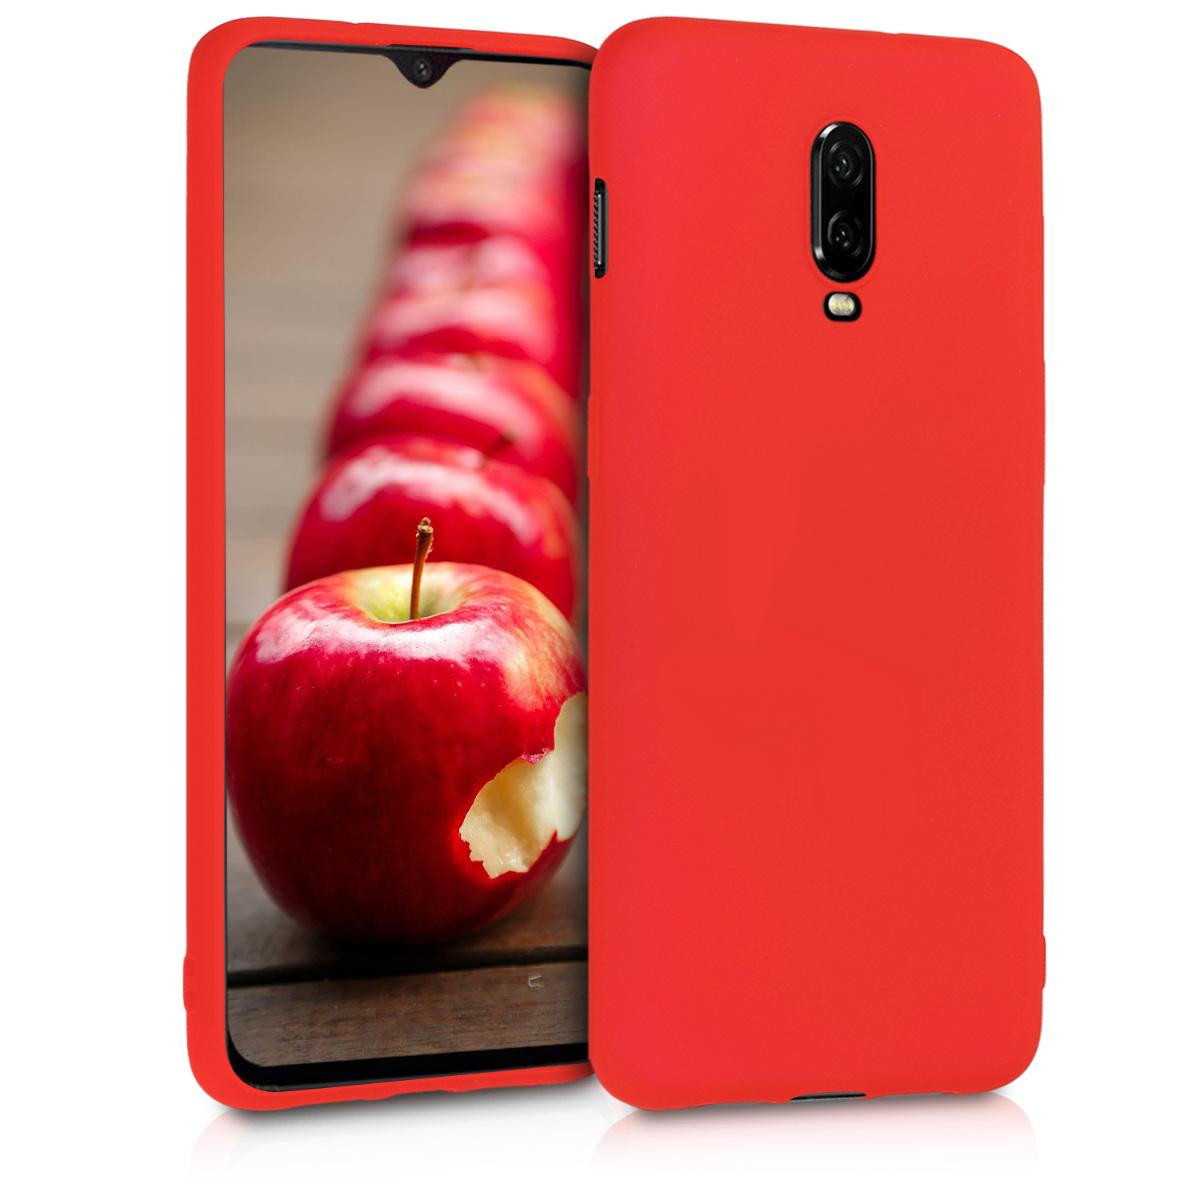 KW Θήκη Σιλικόνης OnePlus 6T - Neon Red (46890.111)